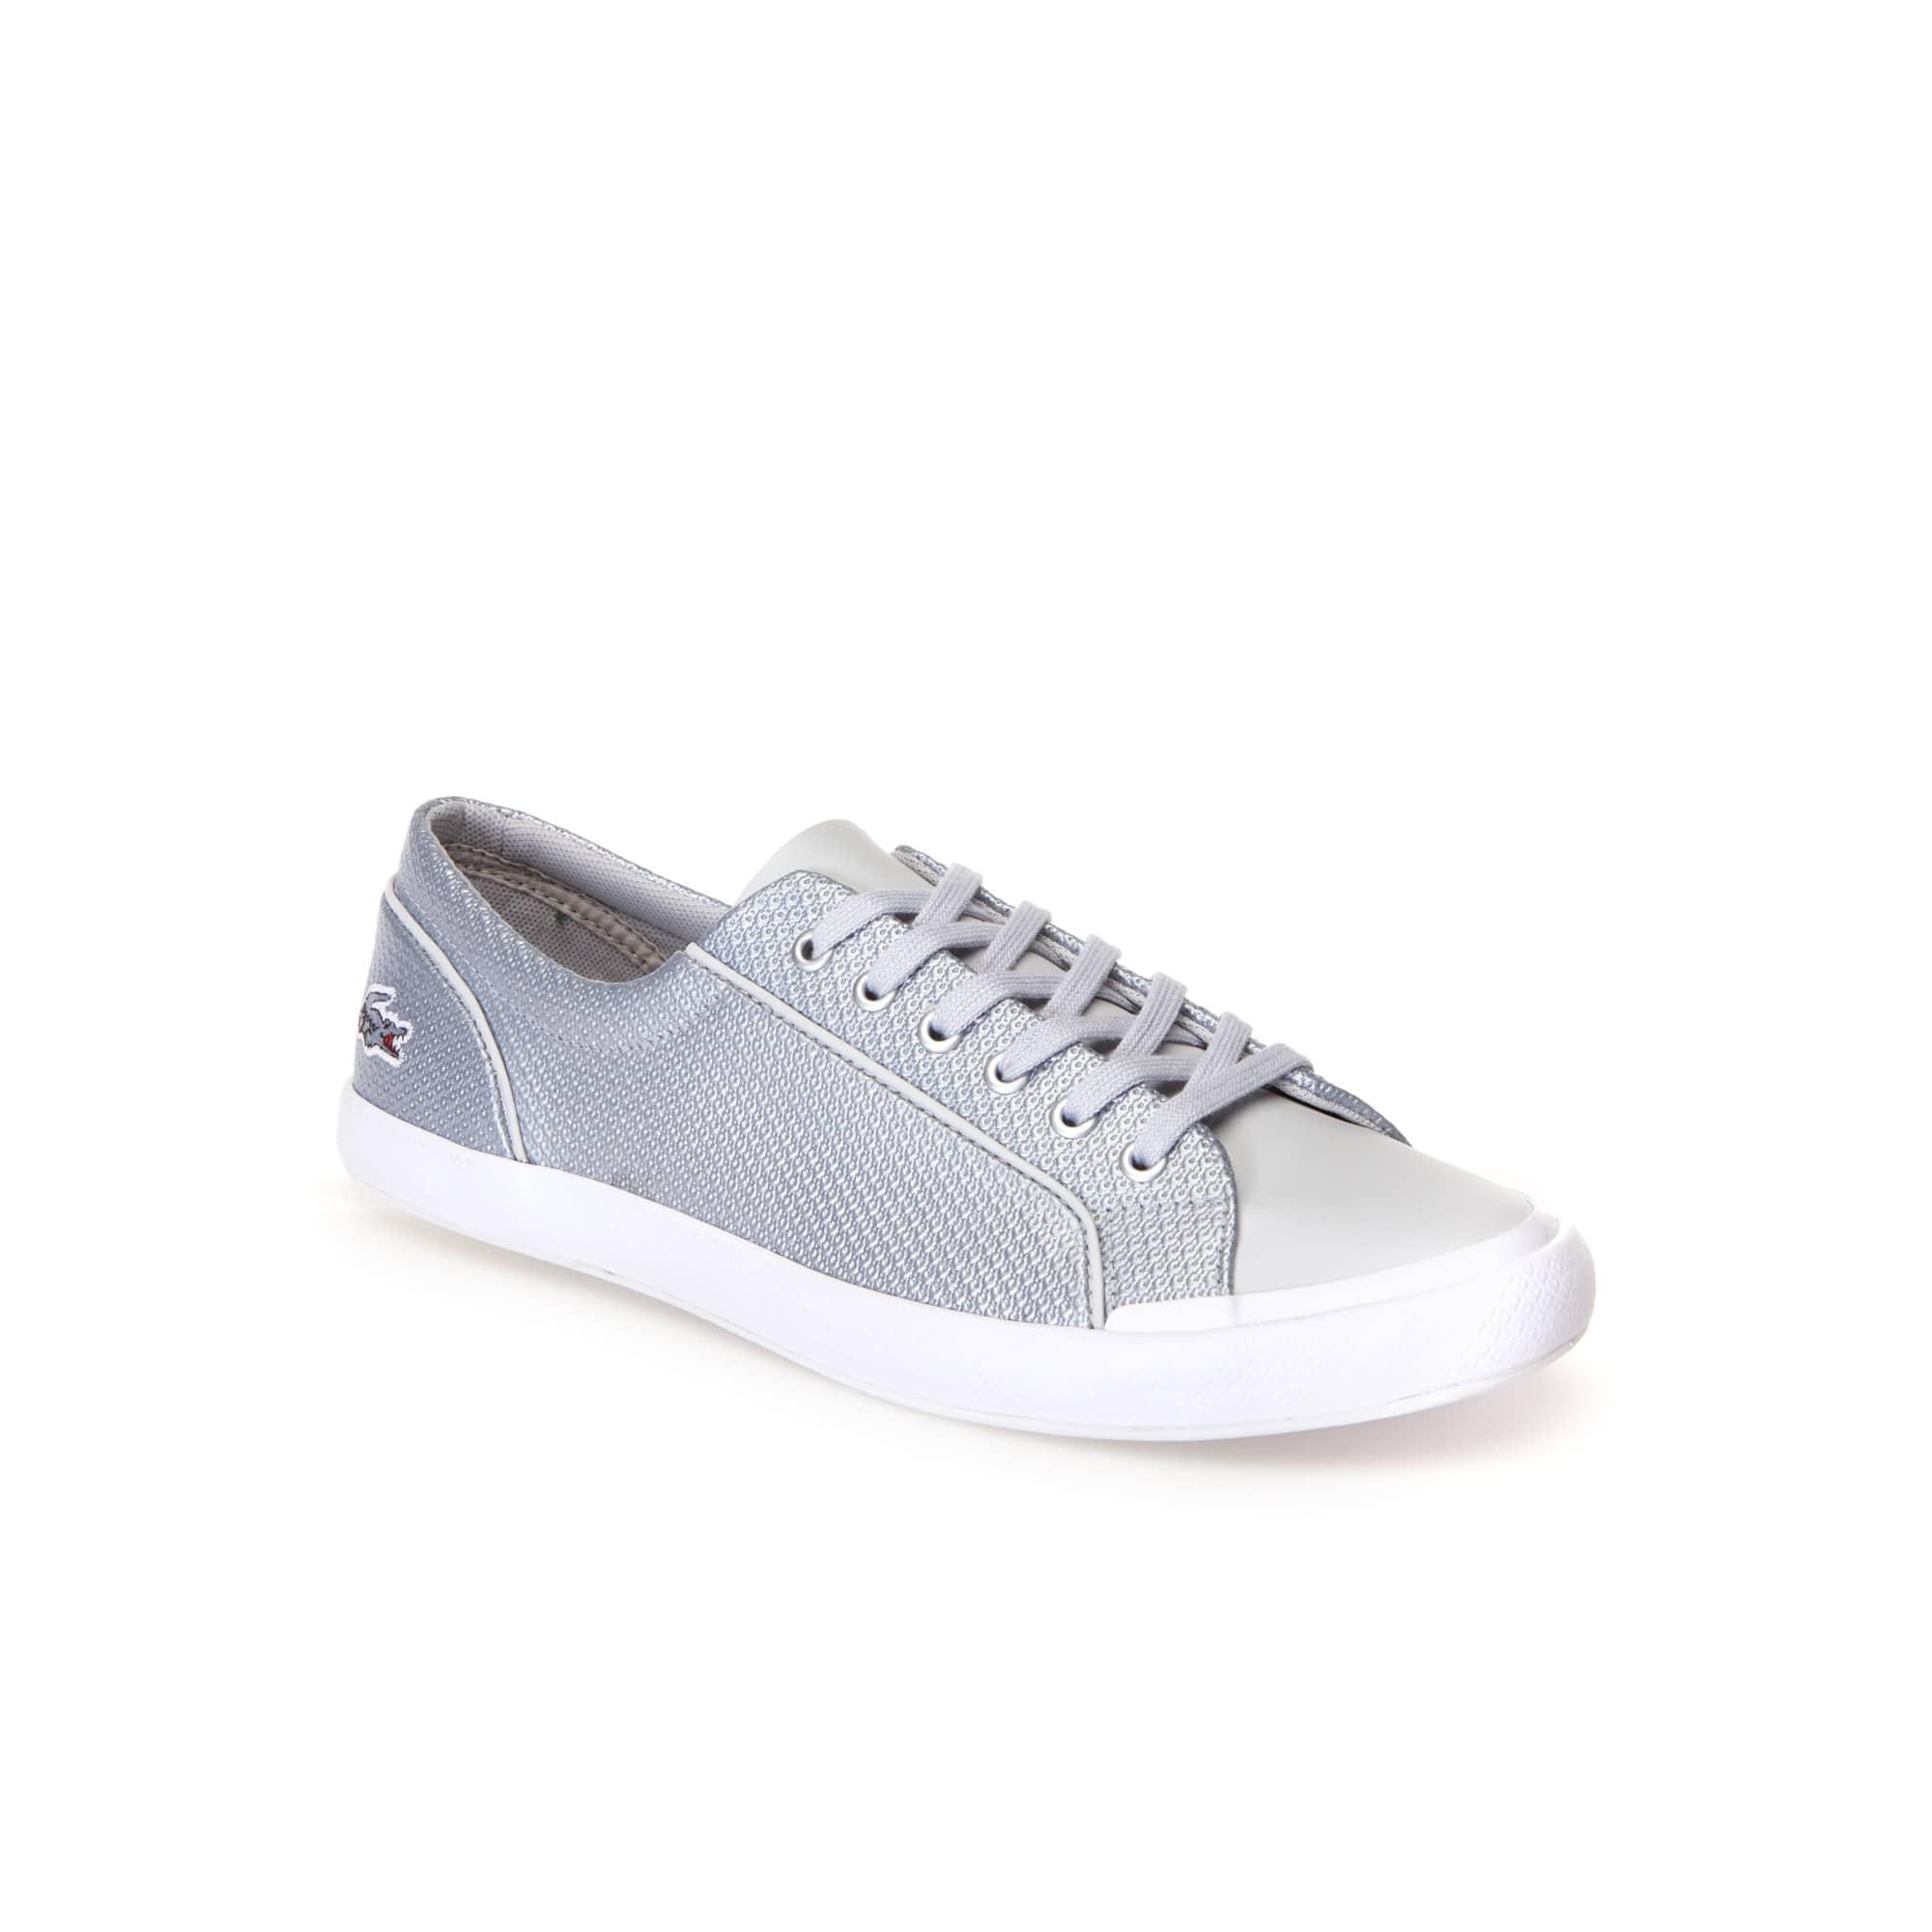 Damen CHANTACO Sneakers LANCELLE SILVER aus Leder